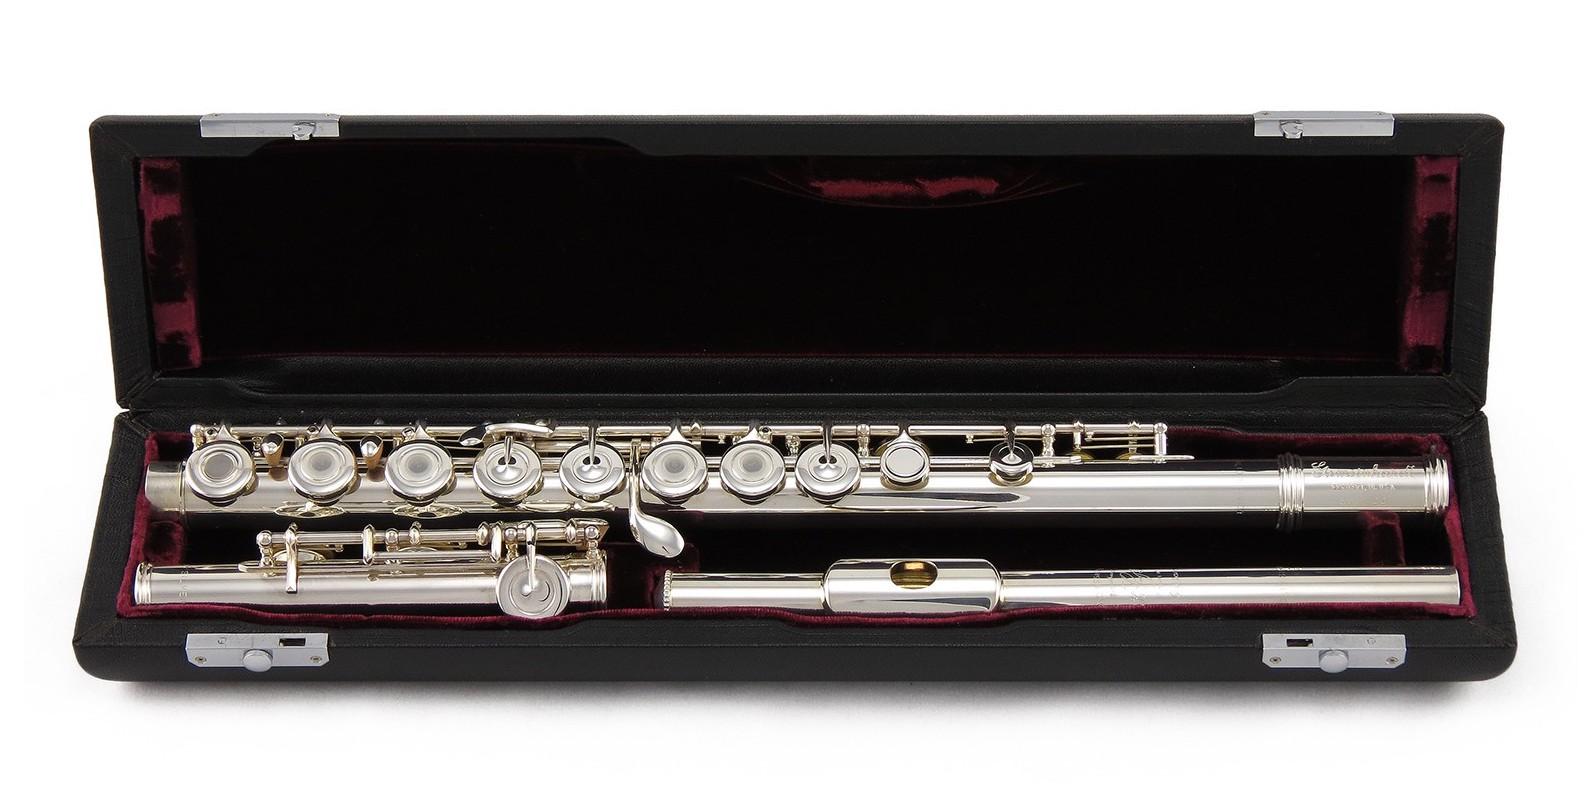 gemeinhardt-733s-professional-flute_lg.jpg